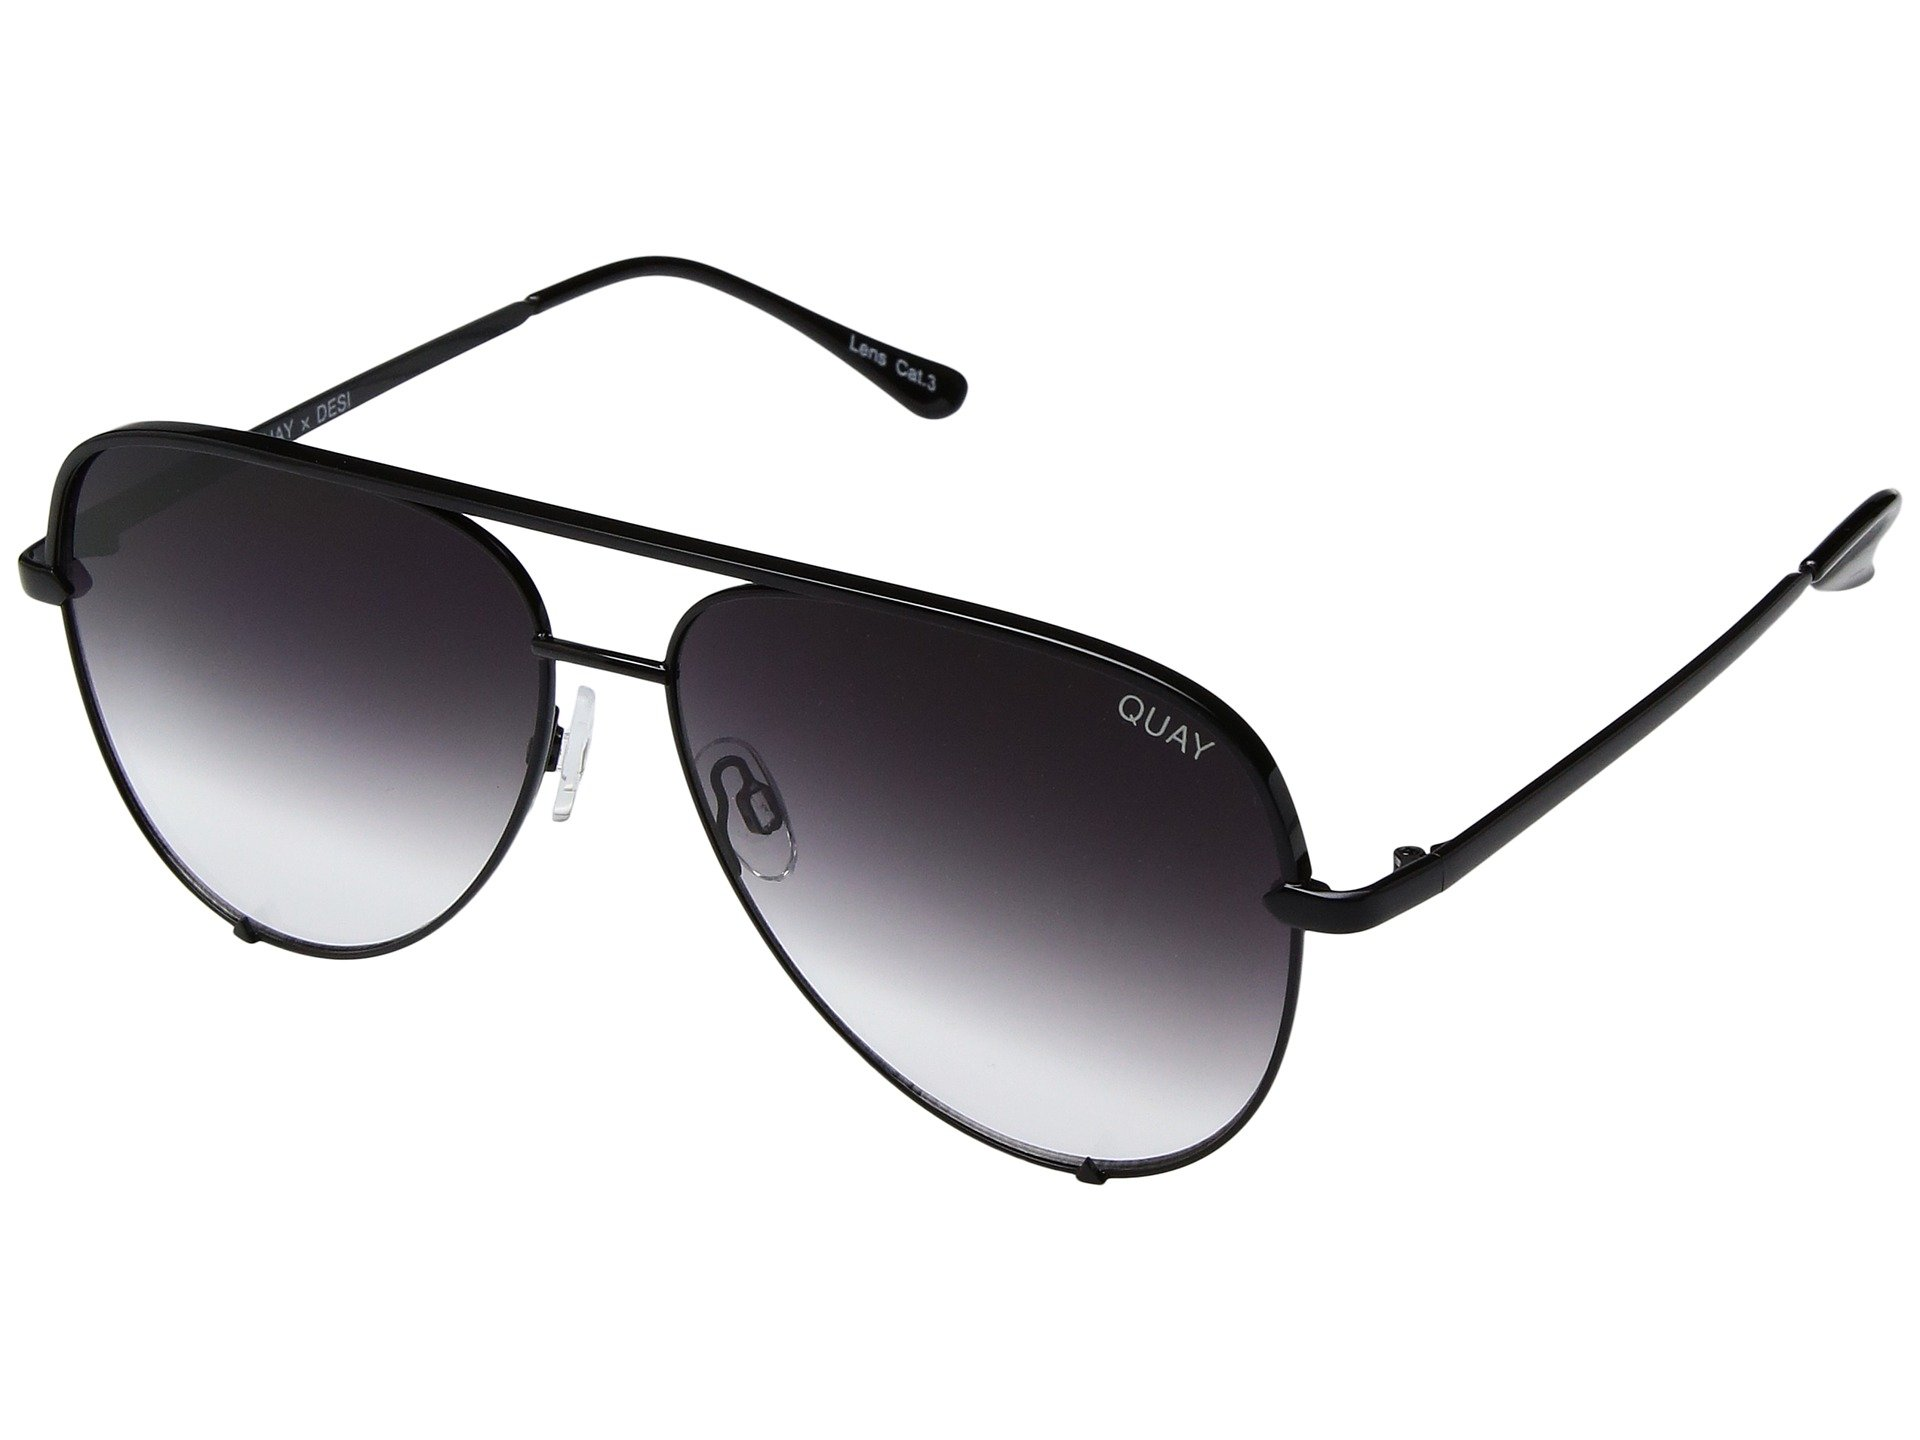 Quay Australia HIGH KEY Men's and Women's Sunglasses Classic Oversized Aviator - Black/Fade by Quay Australia